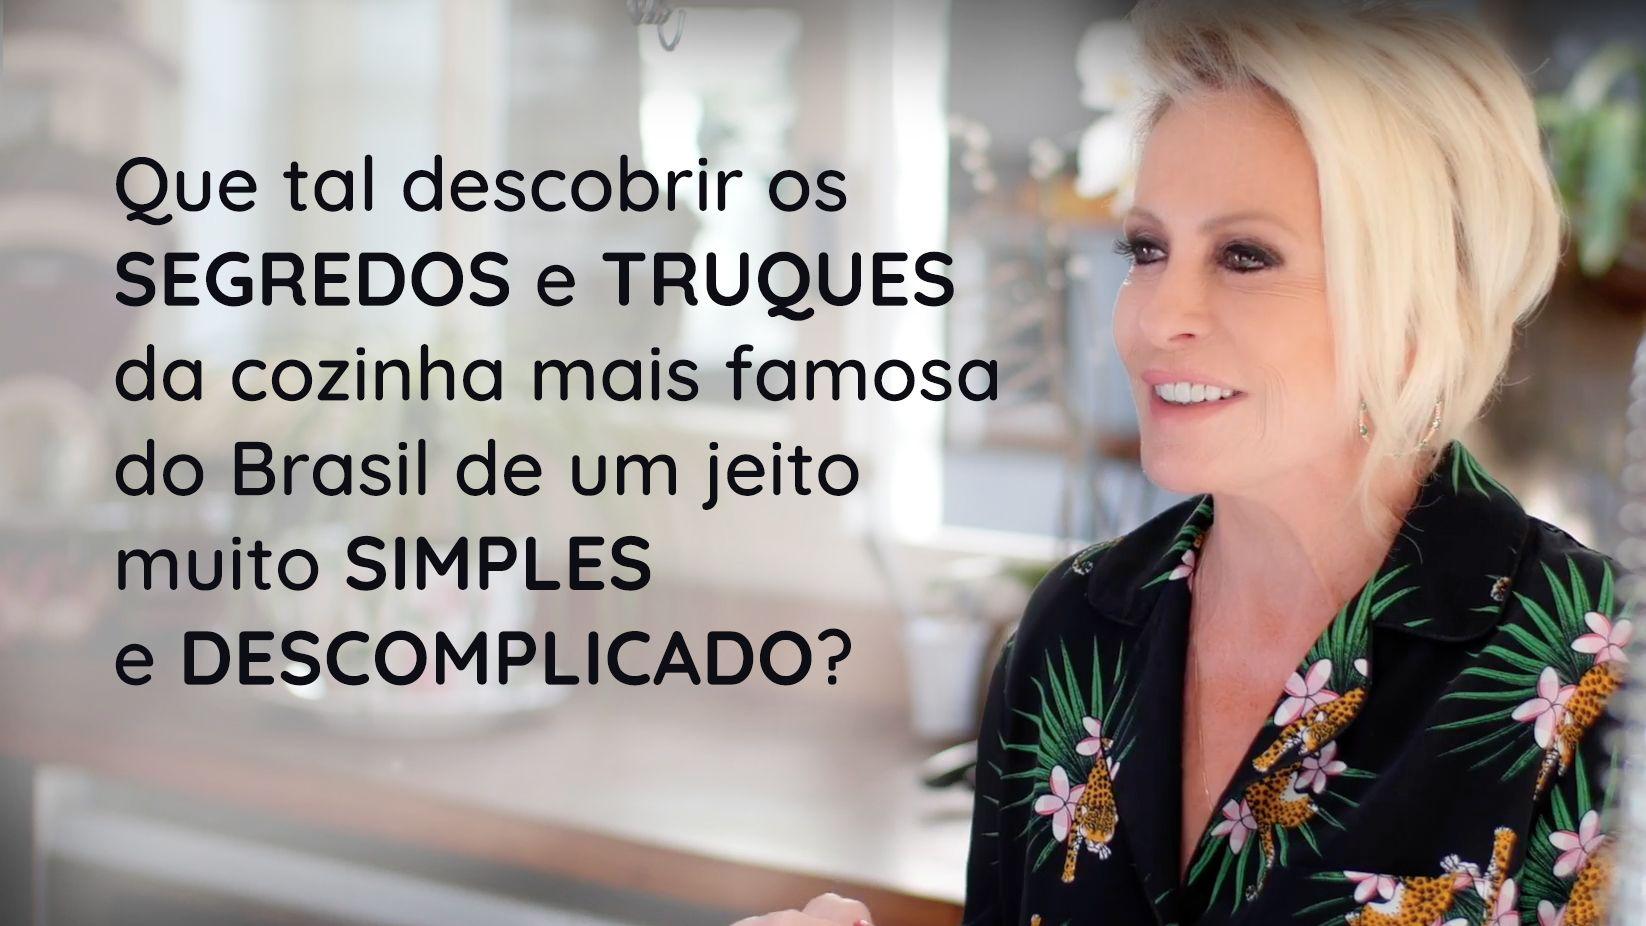 Ana Maria Braga Livro Culinaria Receitas De Petiscos Receitas